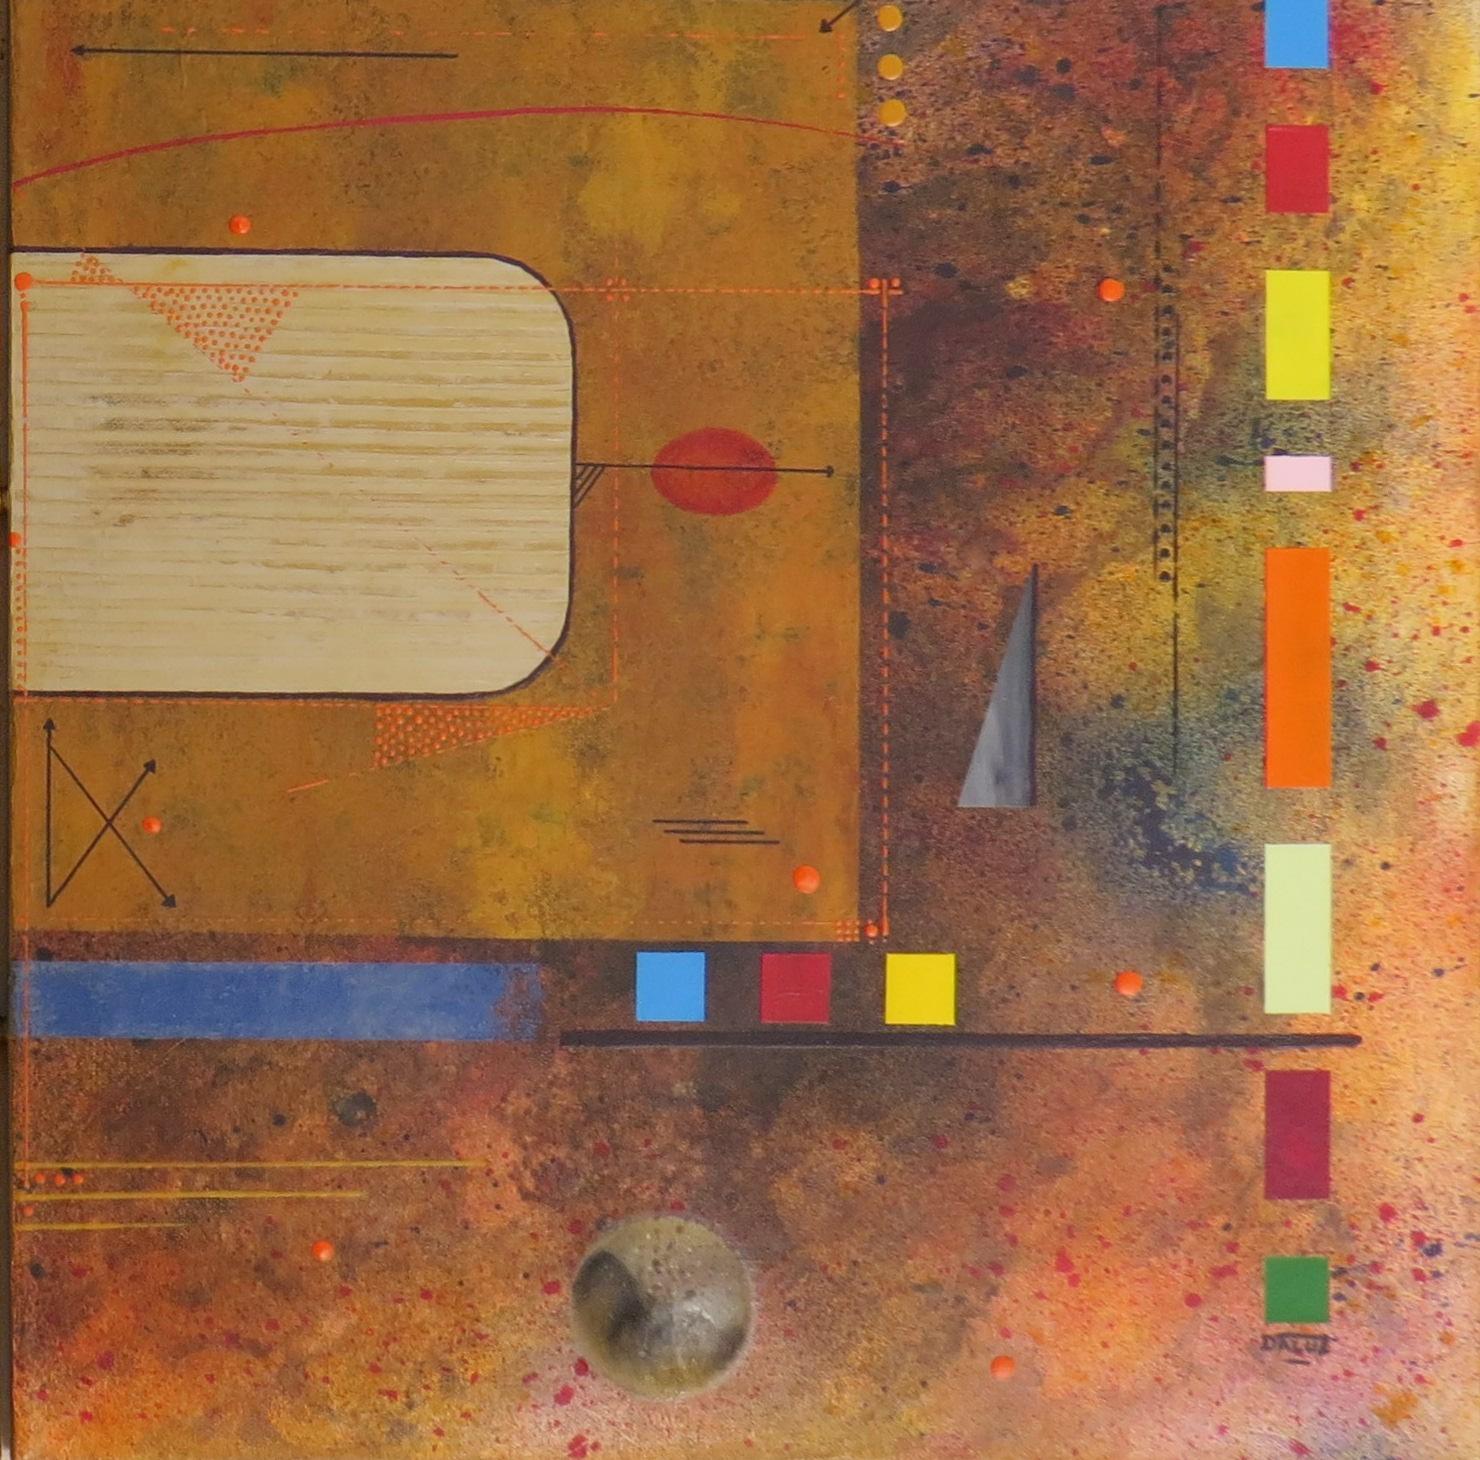 kappa - zoom2 - DALUZ GALEGO - peinture abstraite